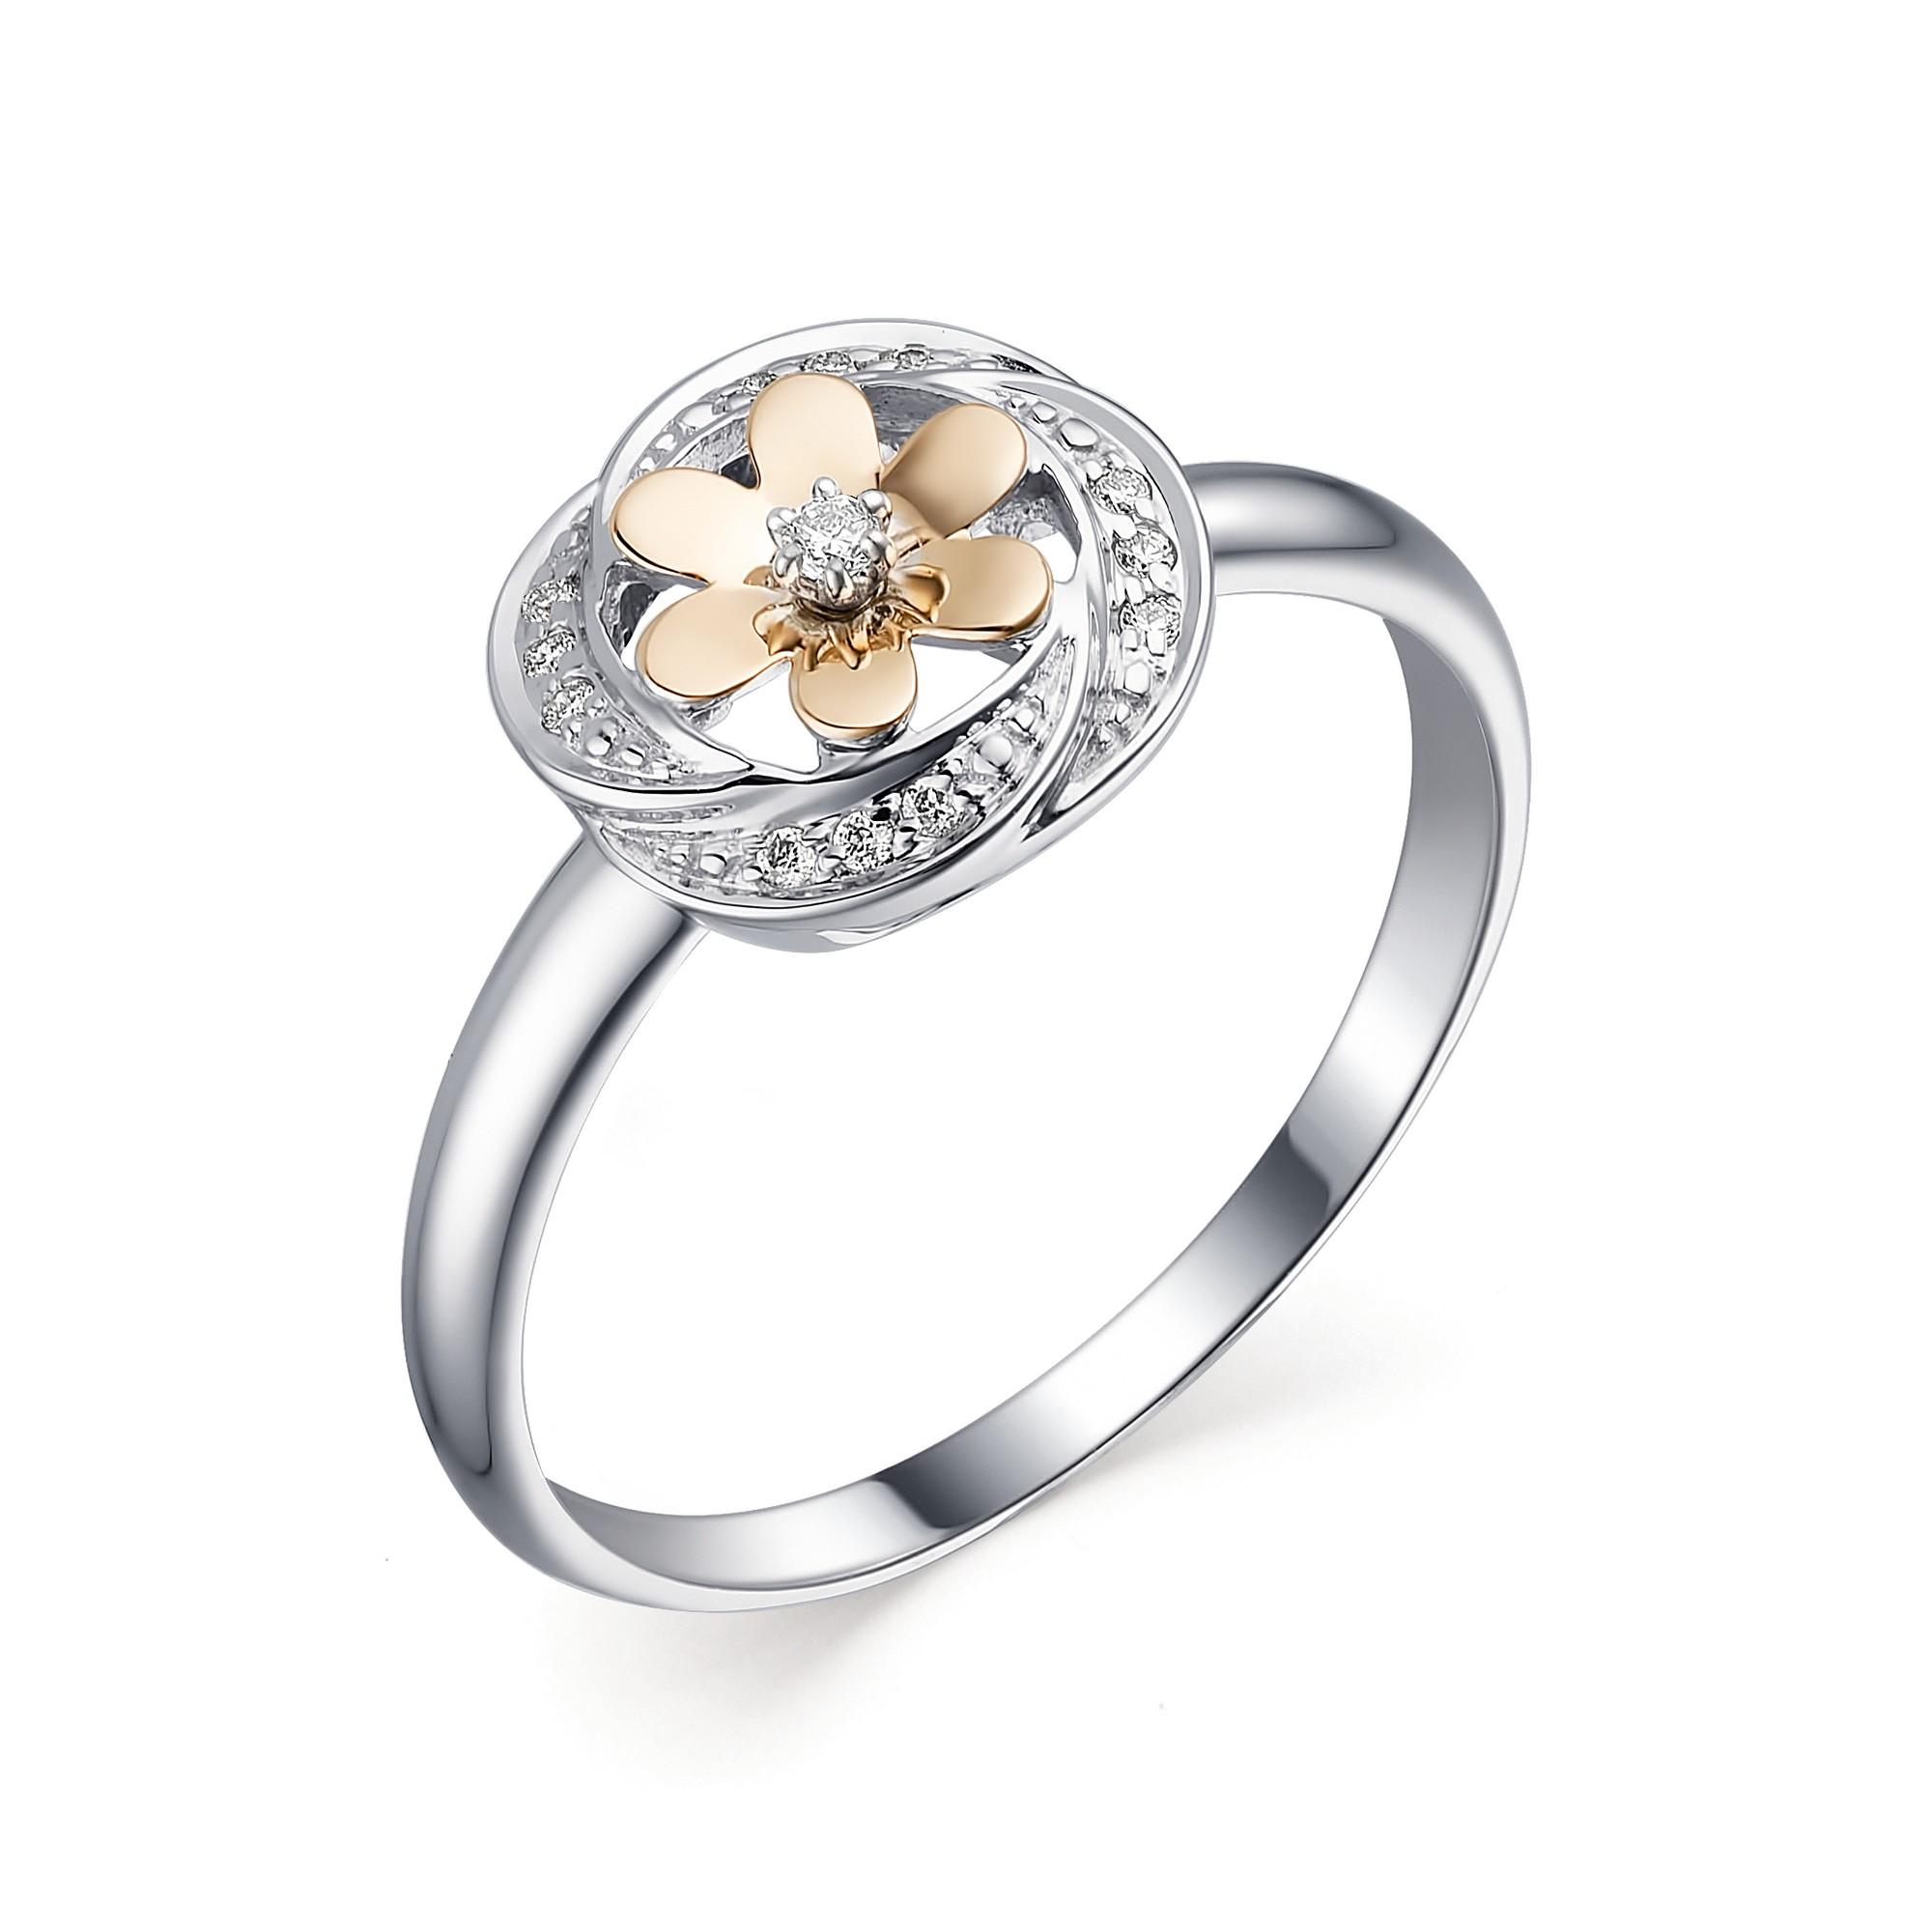 картинка кольцо 13434-100 1 бриллиант круг 57 0,011 60-90 4/5а, 12 бриллиант круг 57 0,035 200-400 4/5а 13434-100